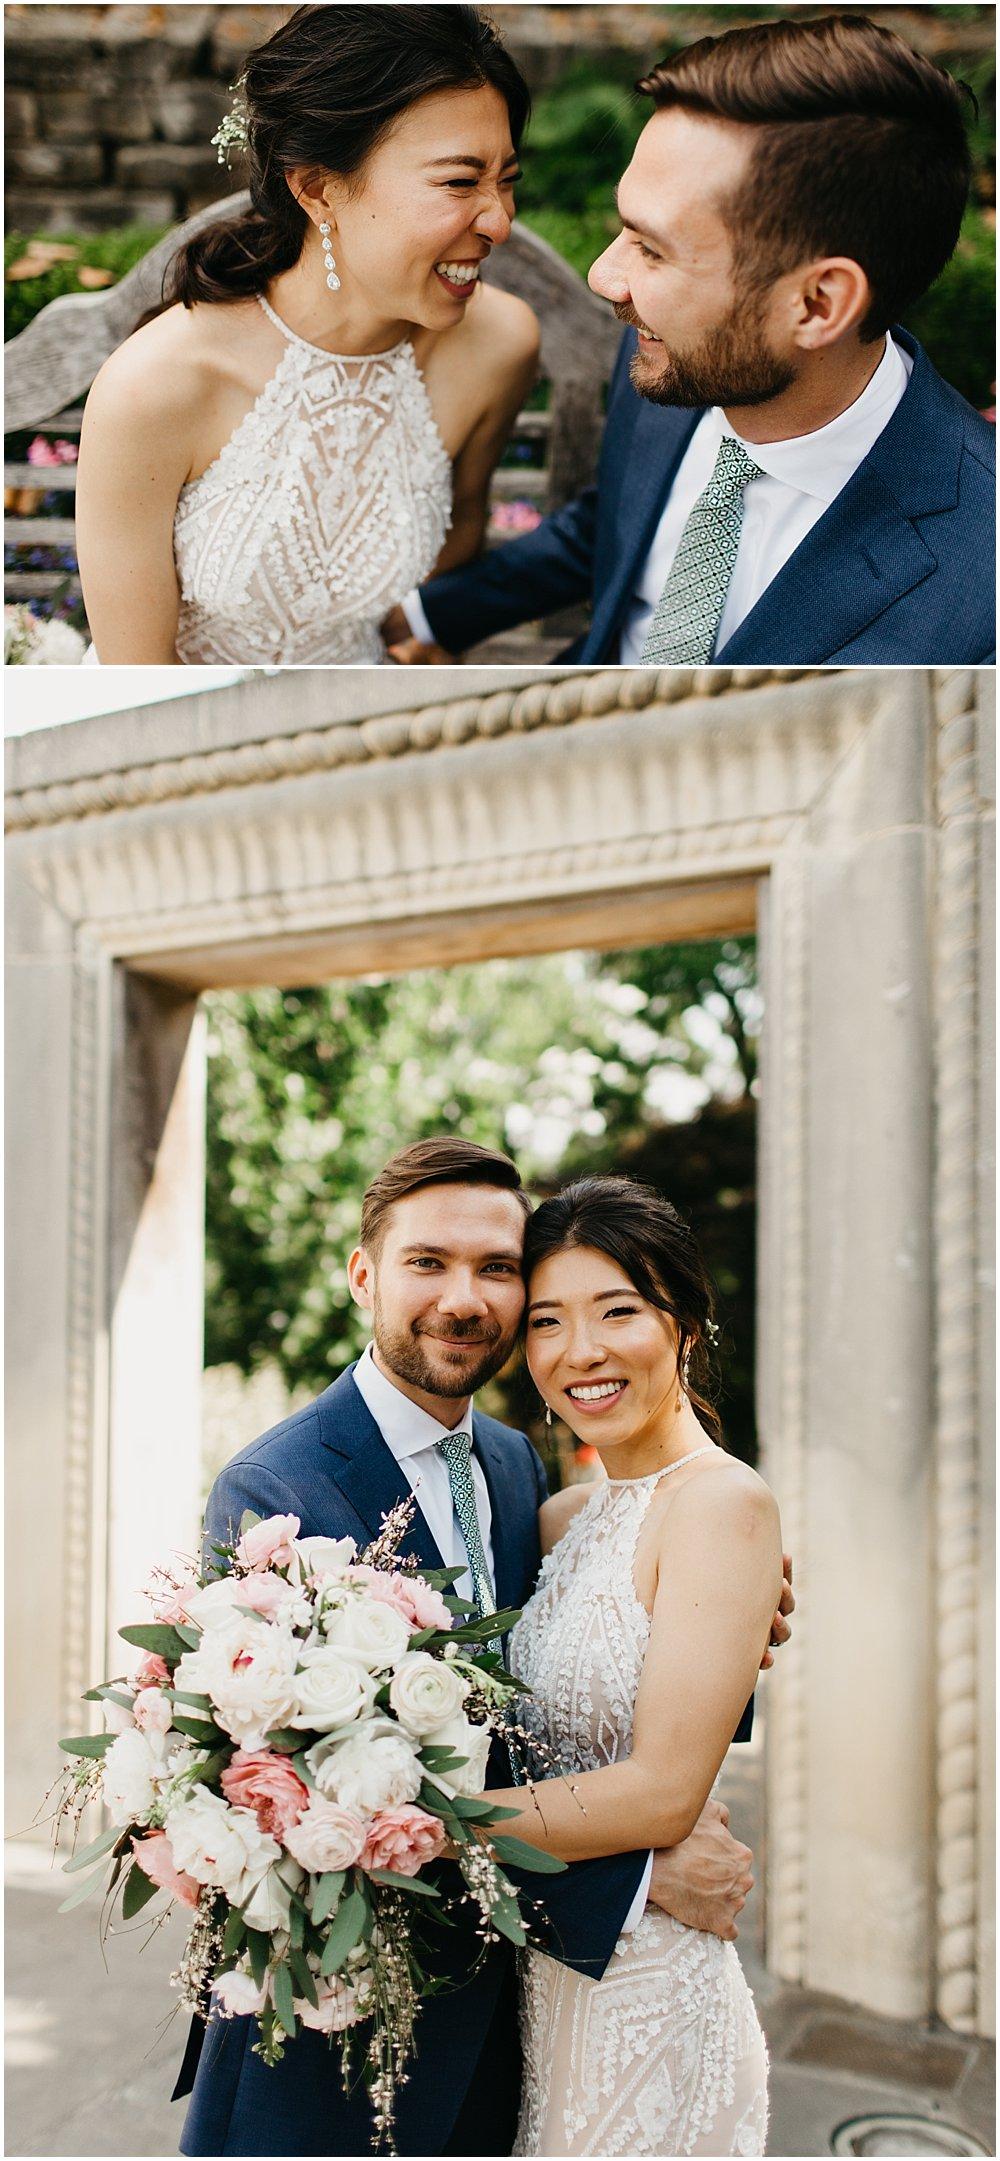 Becca Kracht Photography_Dallas_Texas_Wedding Photography_0069.jpg